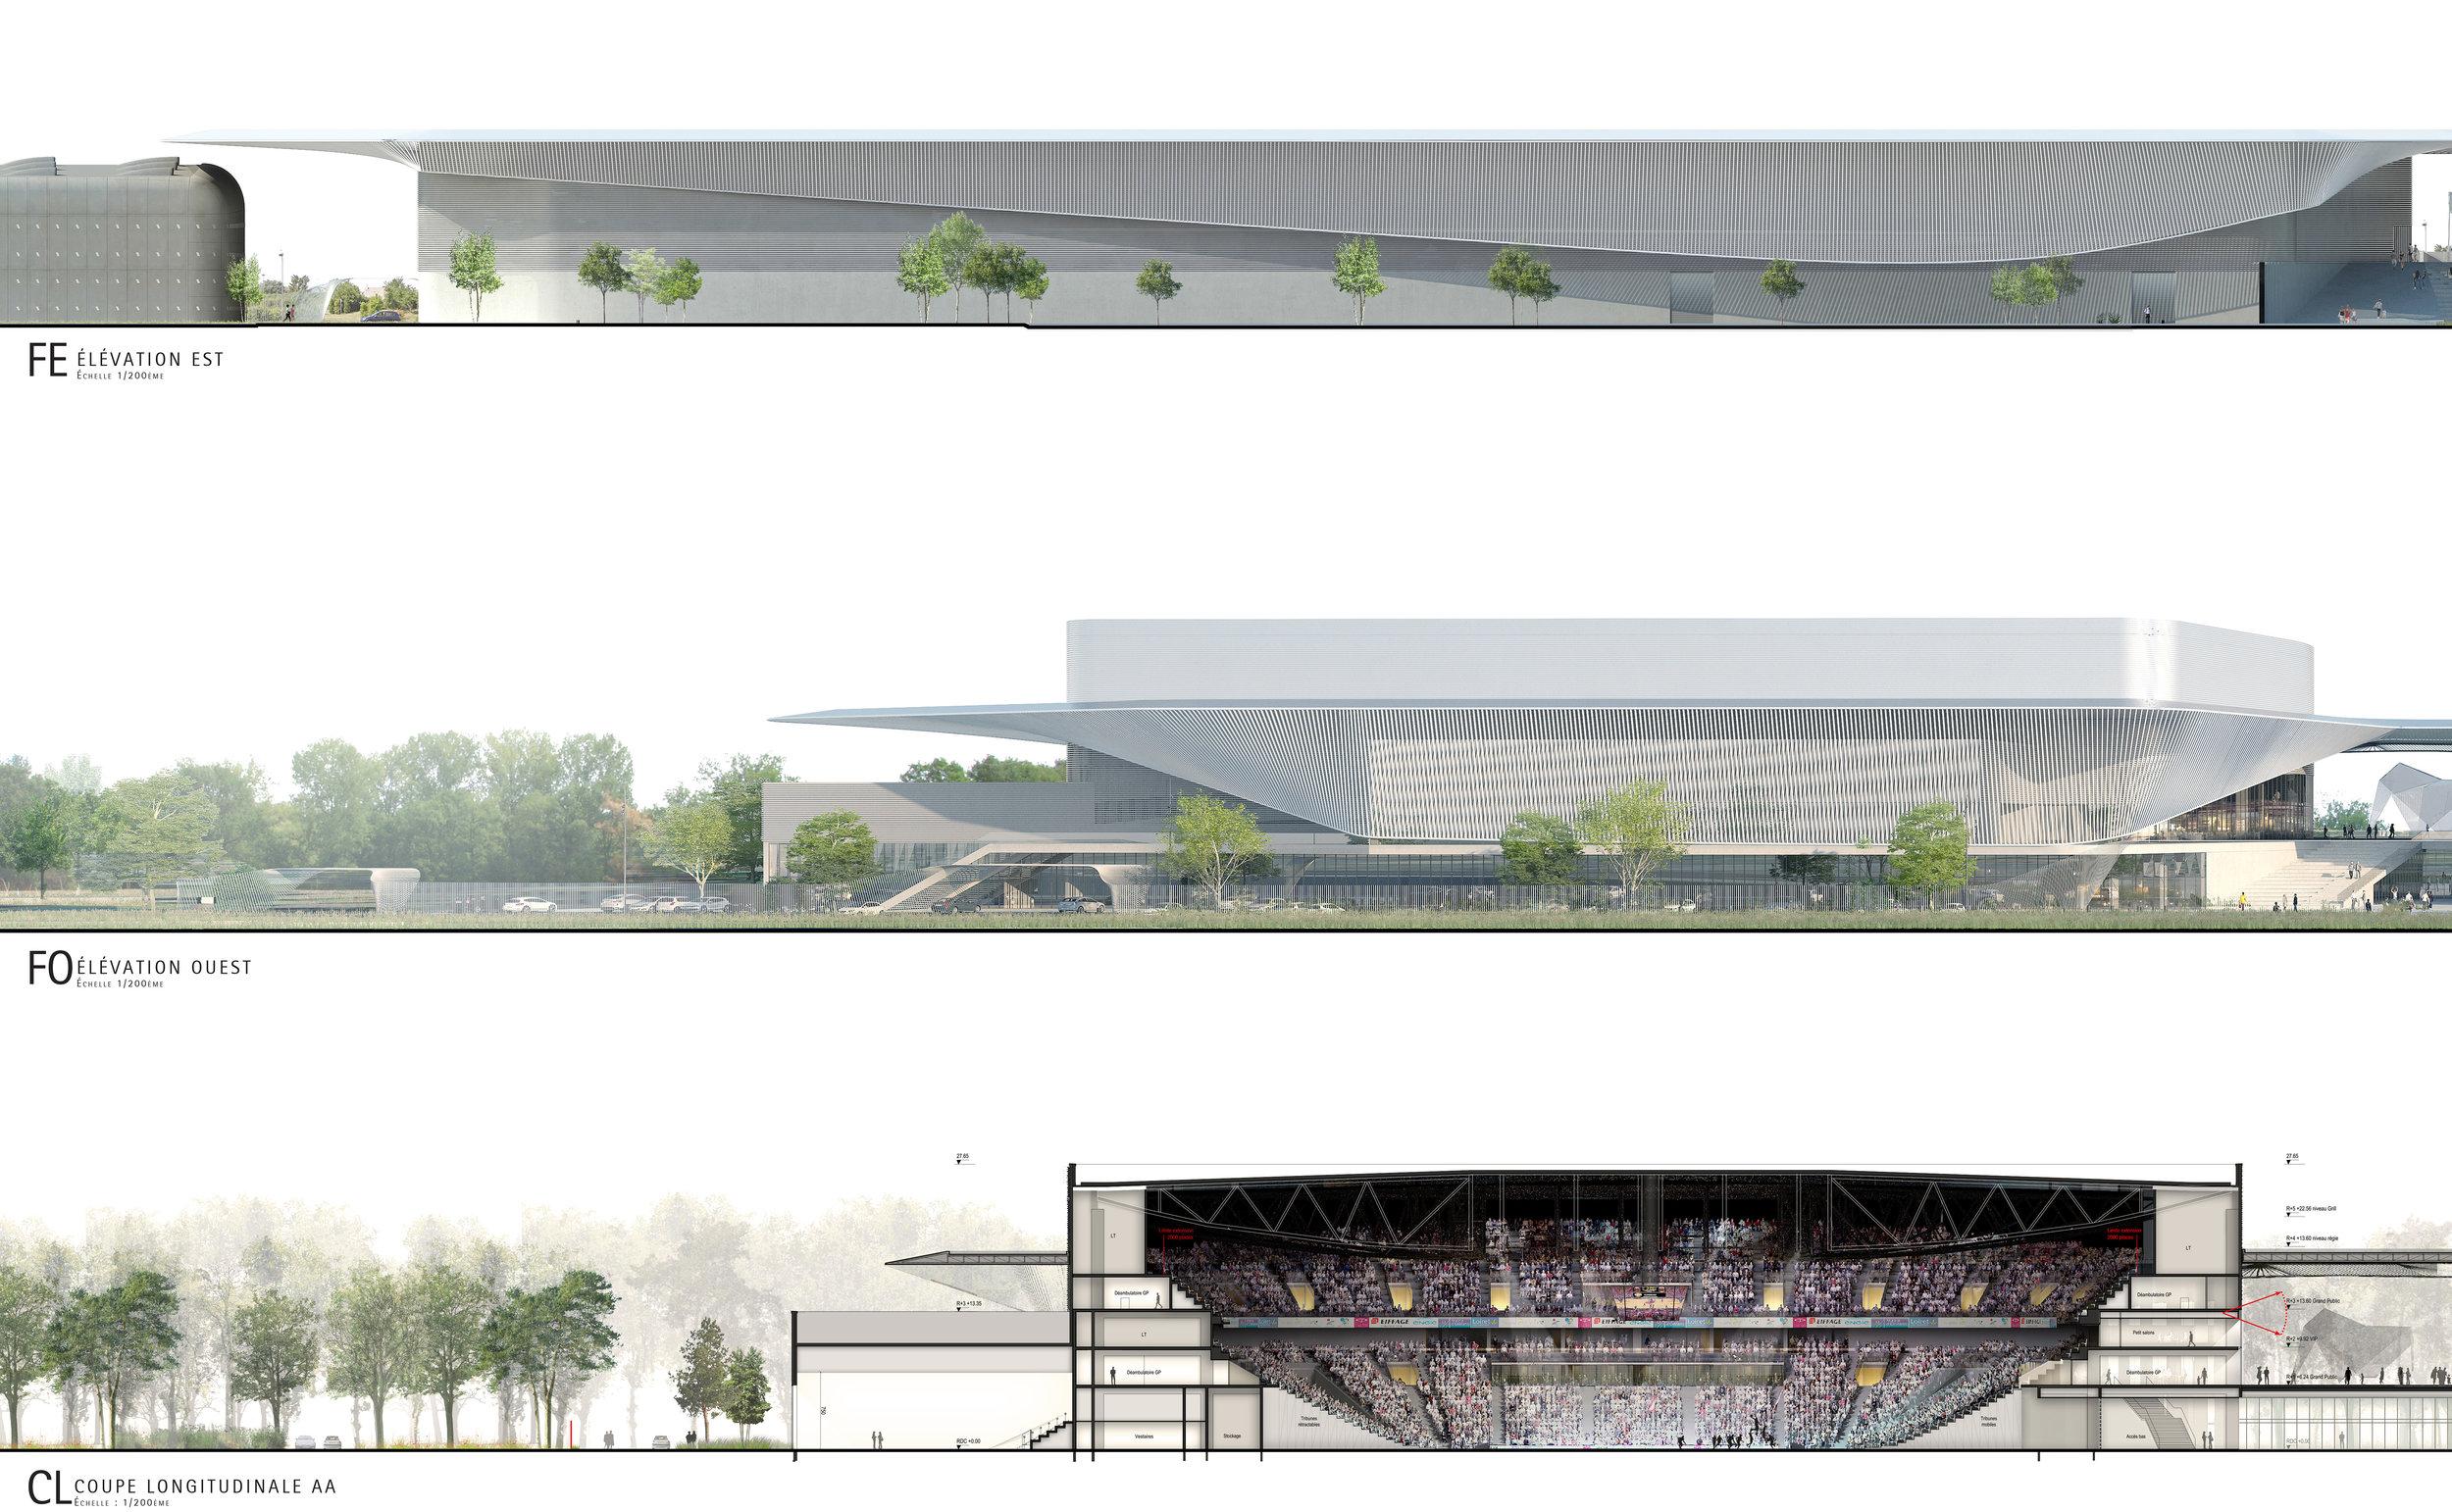 exhibition_center_orleans_public_outdoor_design_christophe_gautrand_landscape_4.jpg